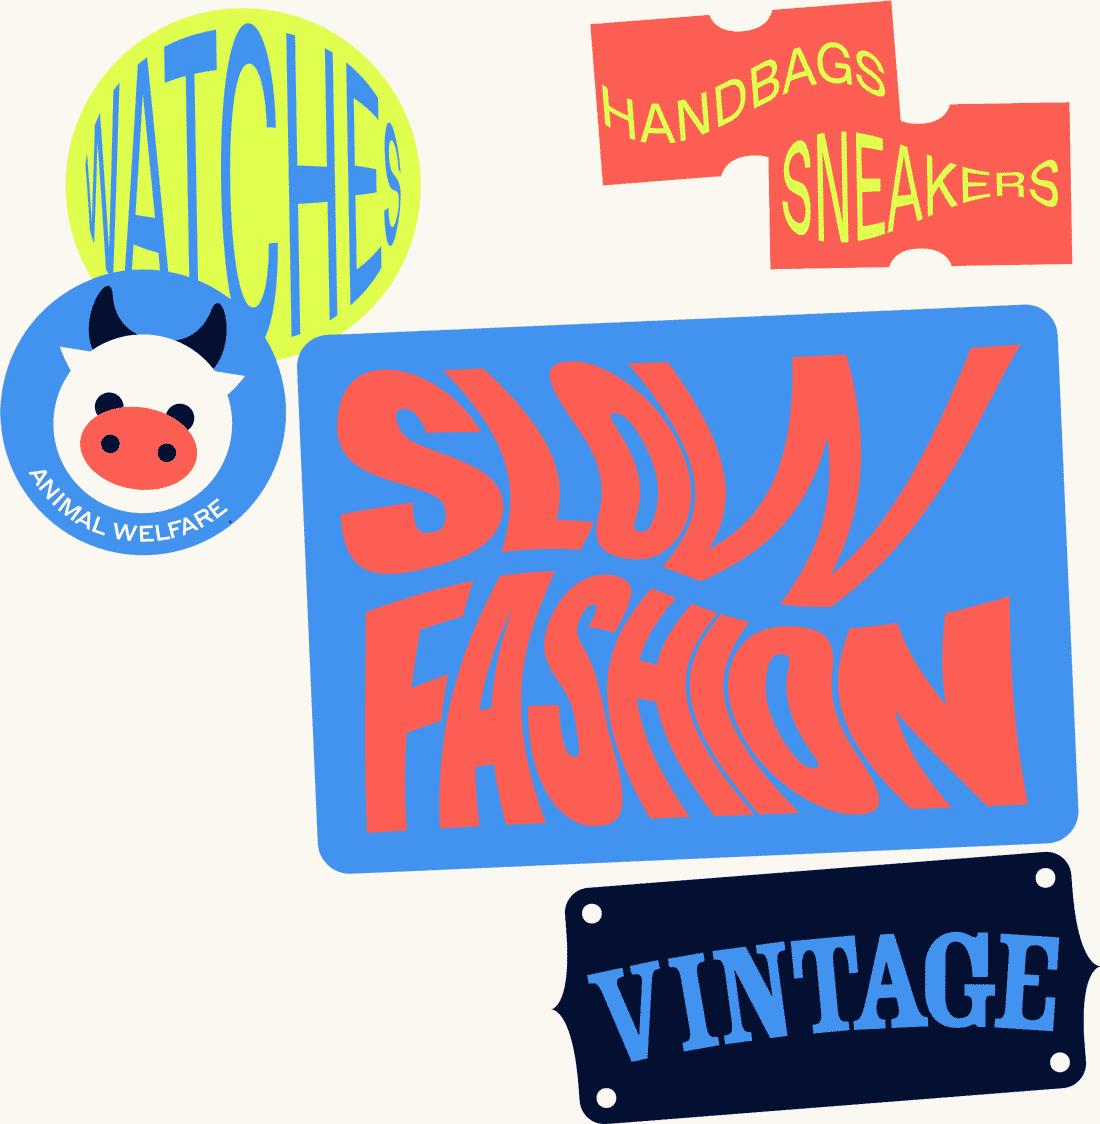 Slow Fashion, Vintage, handbags, sneakers stickers